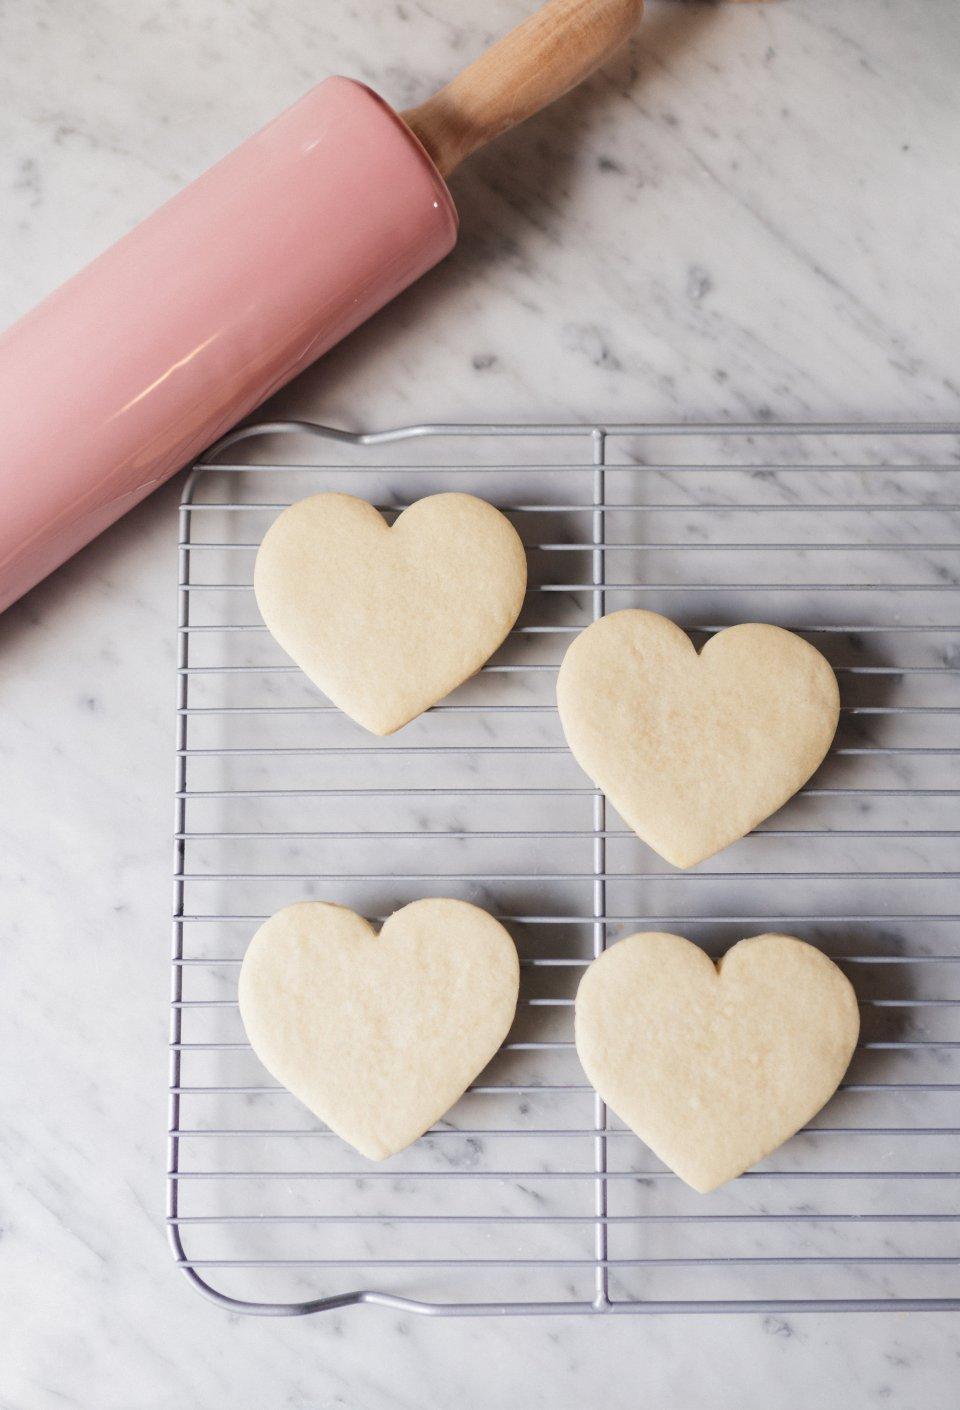 heartshapedcookies1